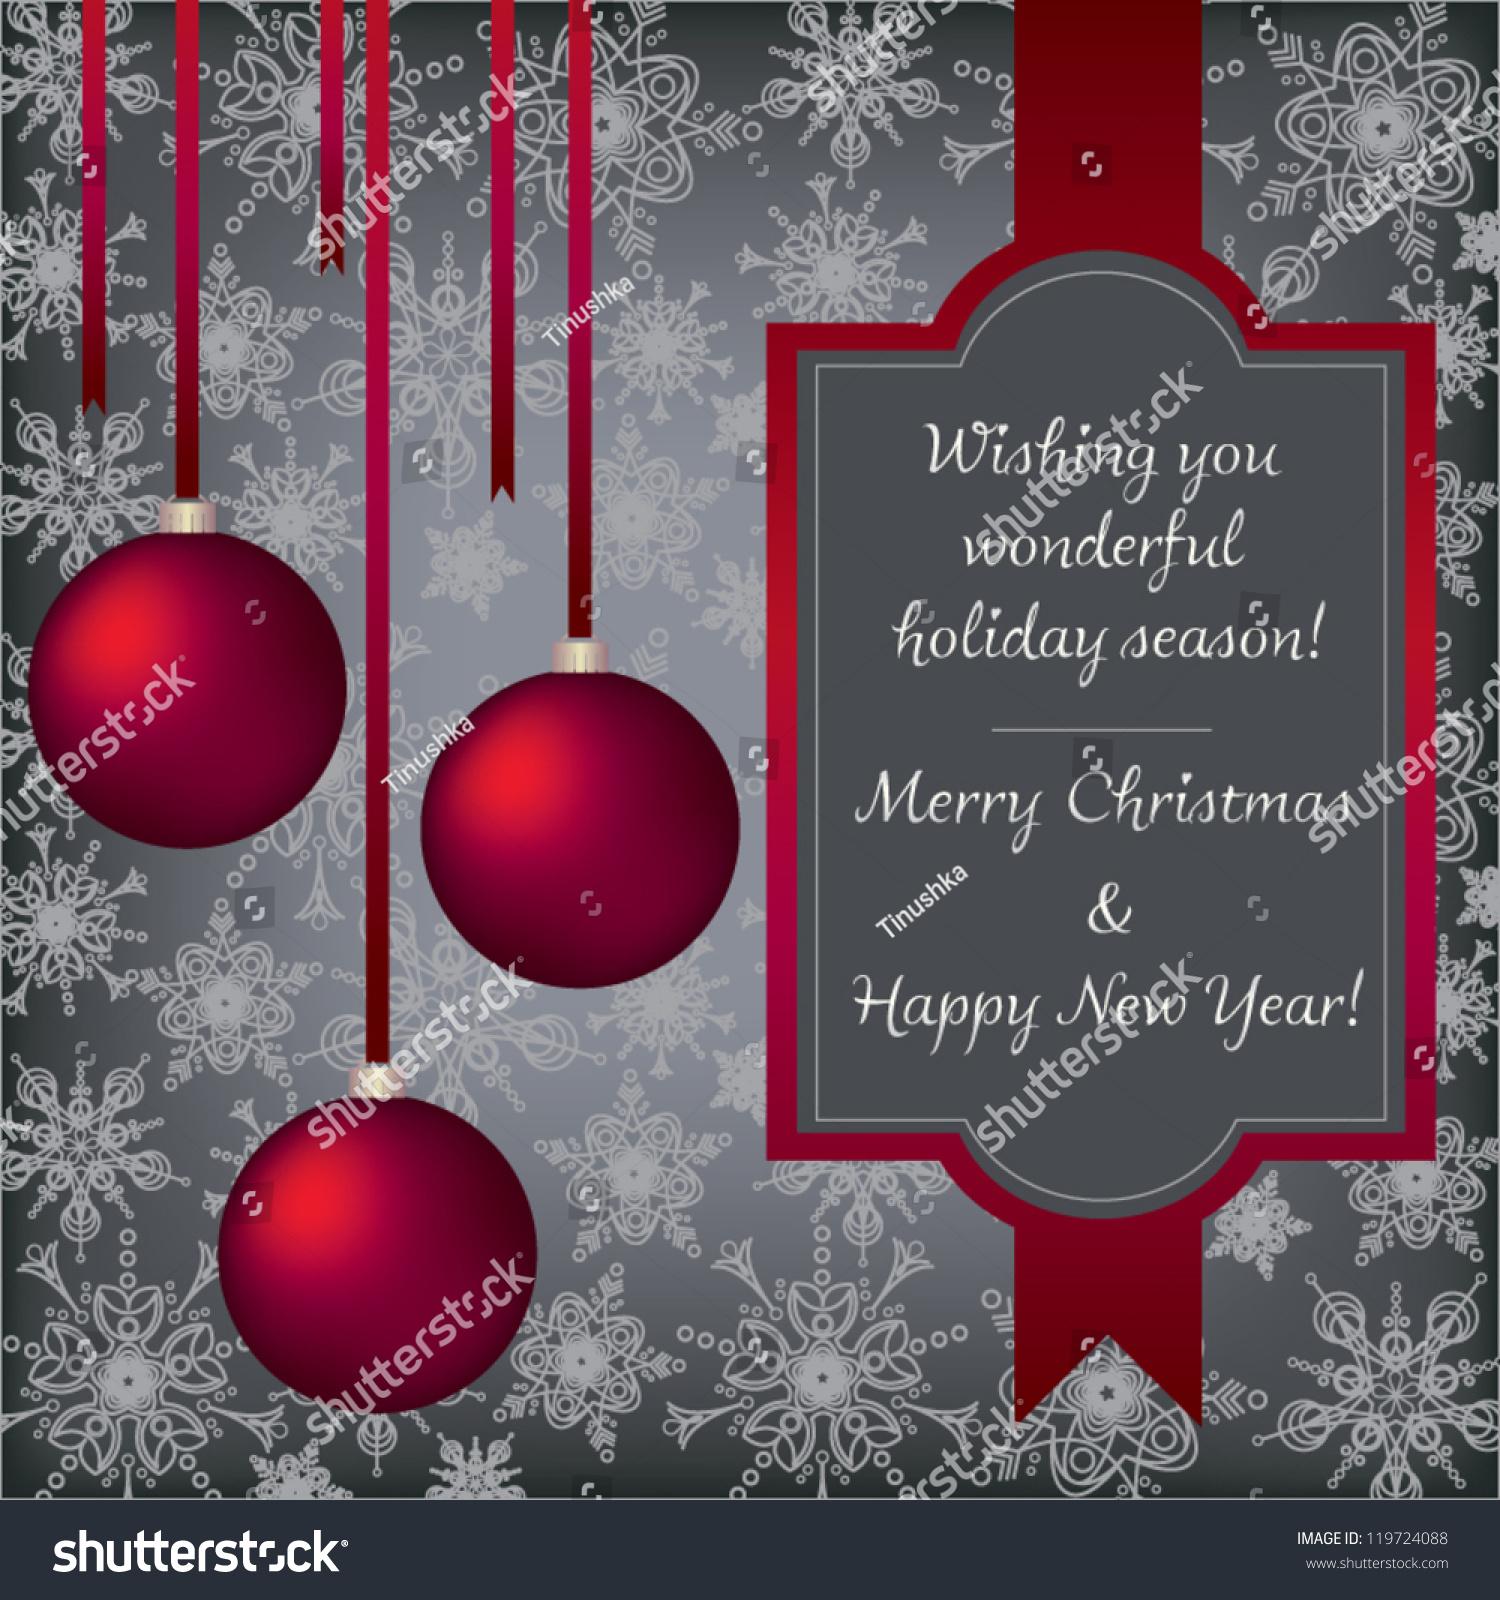 Elegant vintage christmas new year greeting stock vector 119724088 elegant vintage christmas and new year greeting card with red christmas balls and ribbon vector kristyandbryce Images